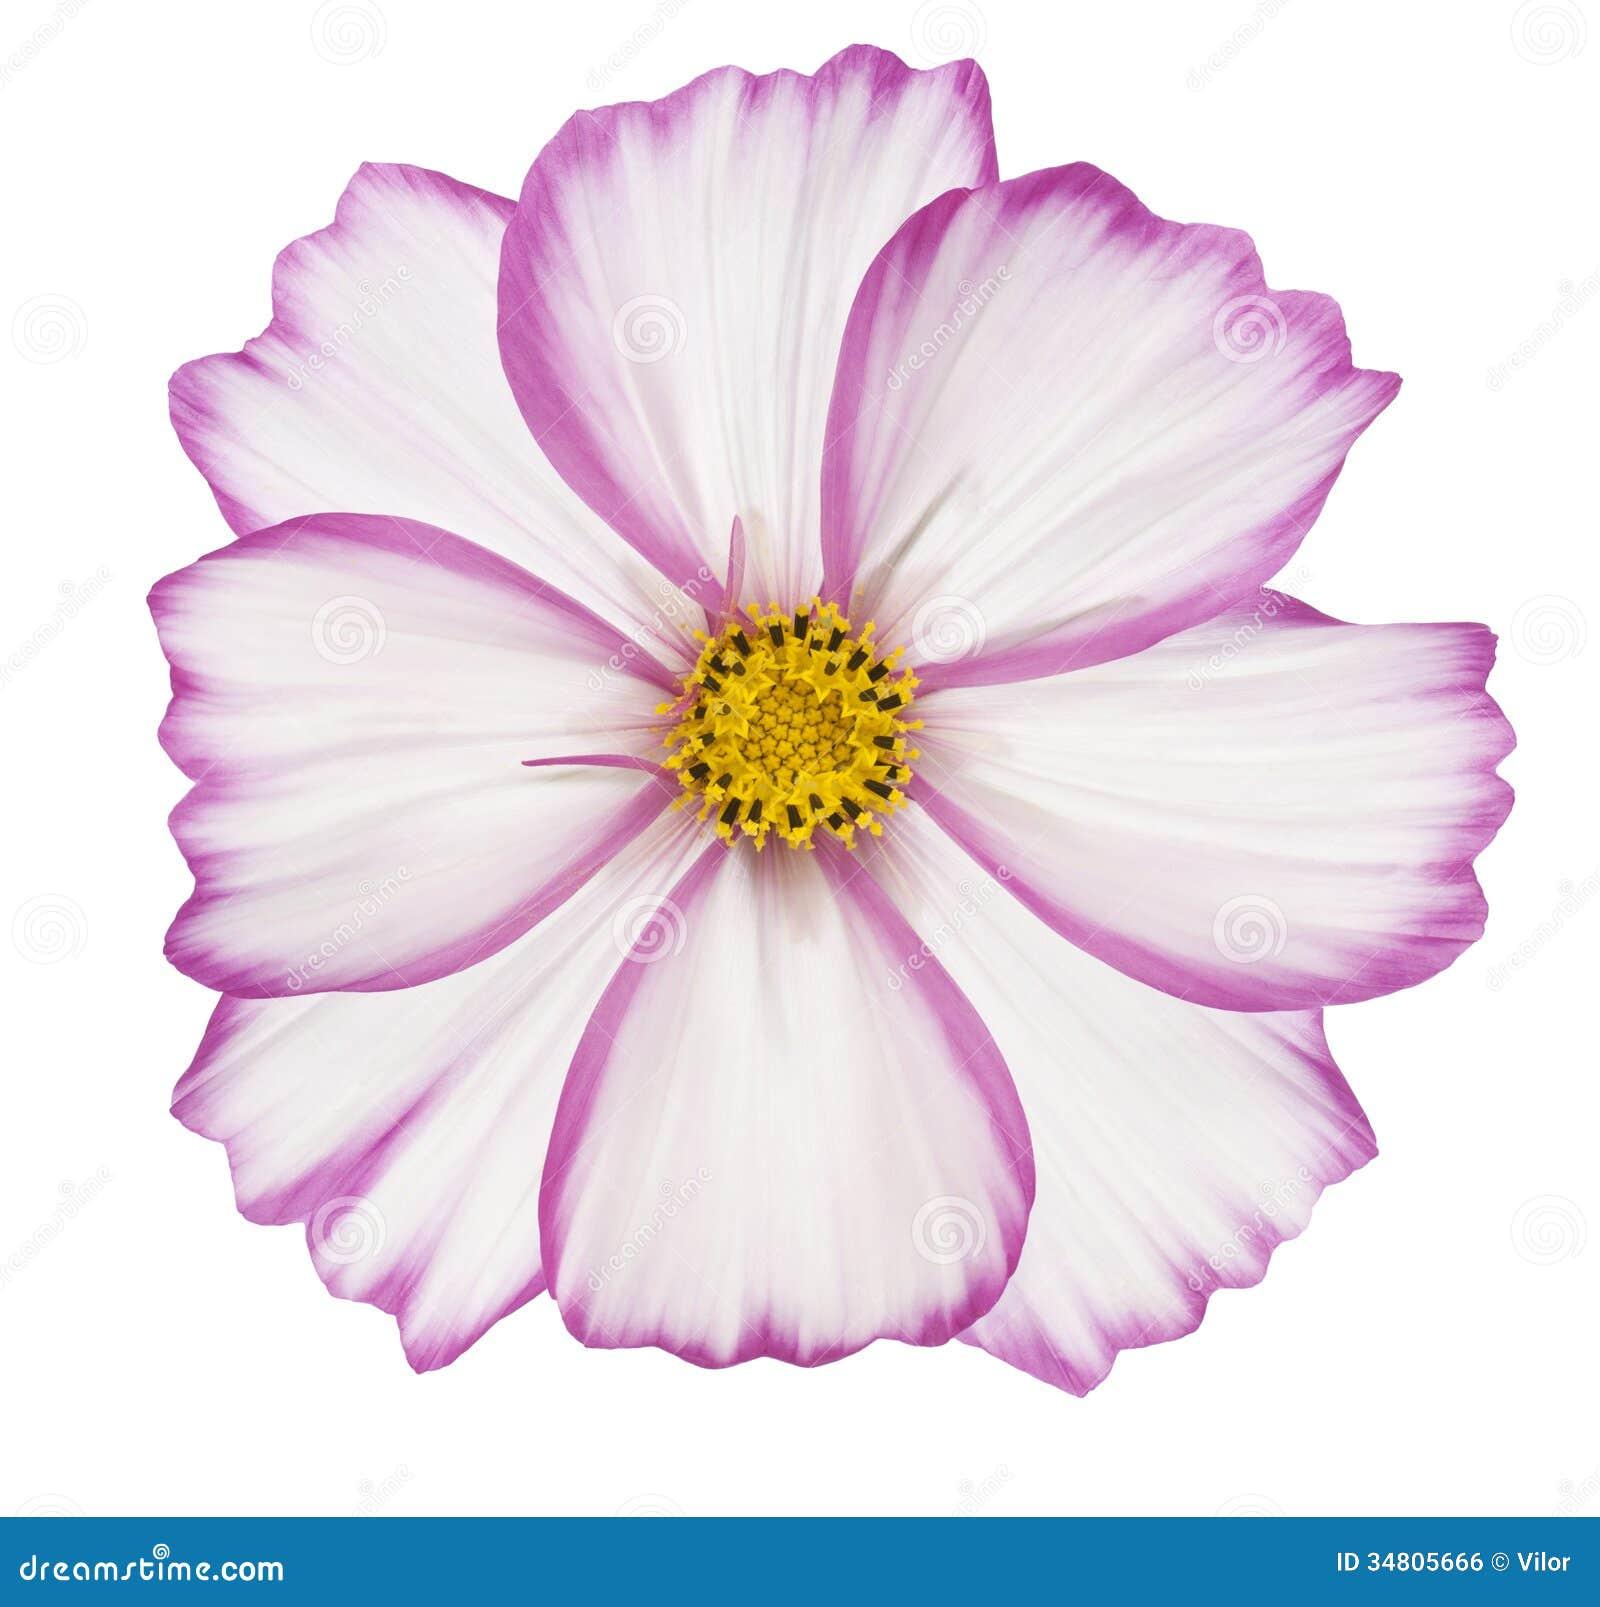 Cosmos Stock Photo Image Of Focus Flower Plant Marguerite 34805666